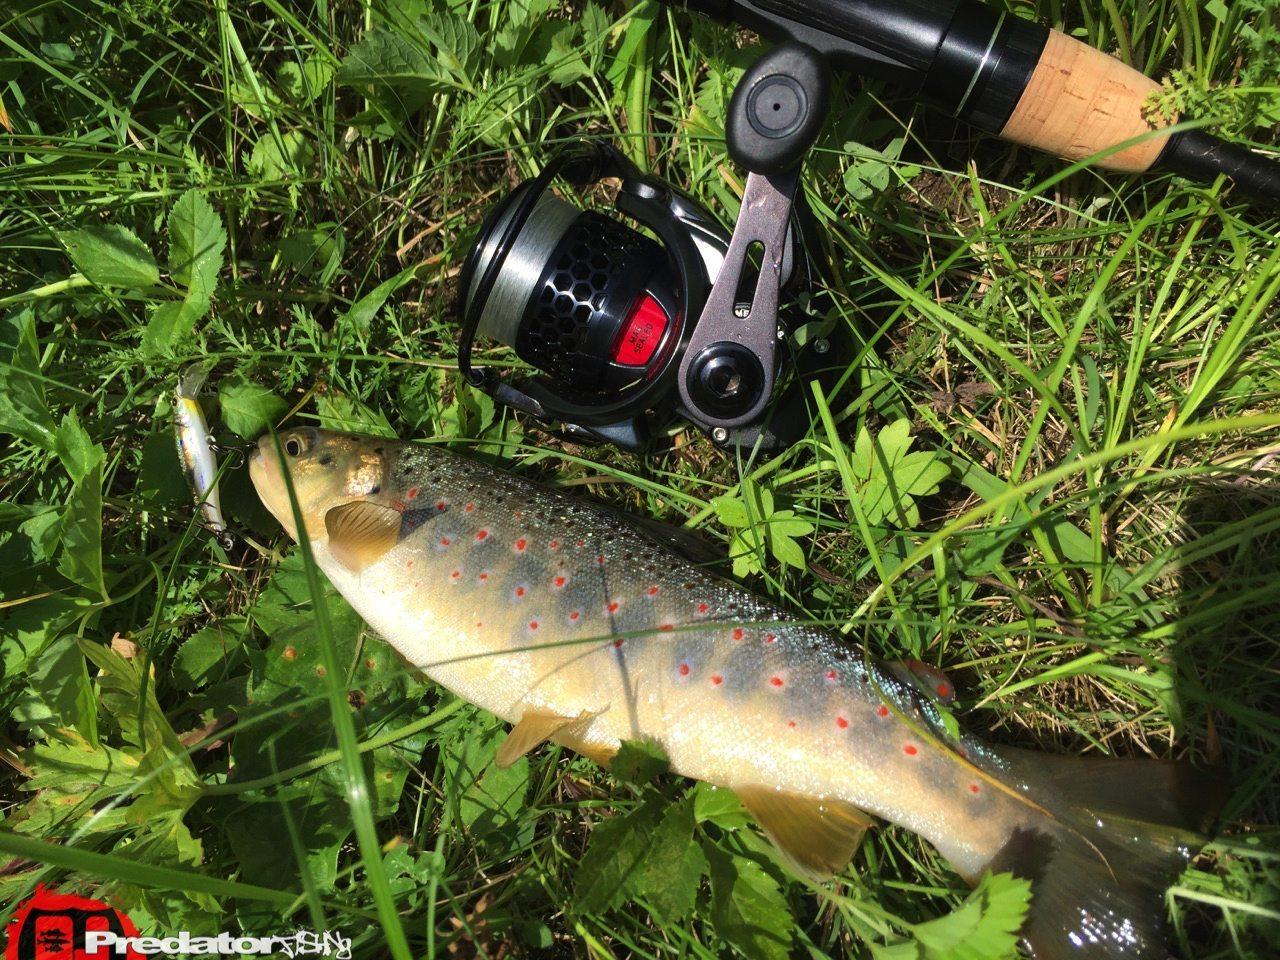 Abk Hlung predator fishing